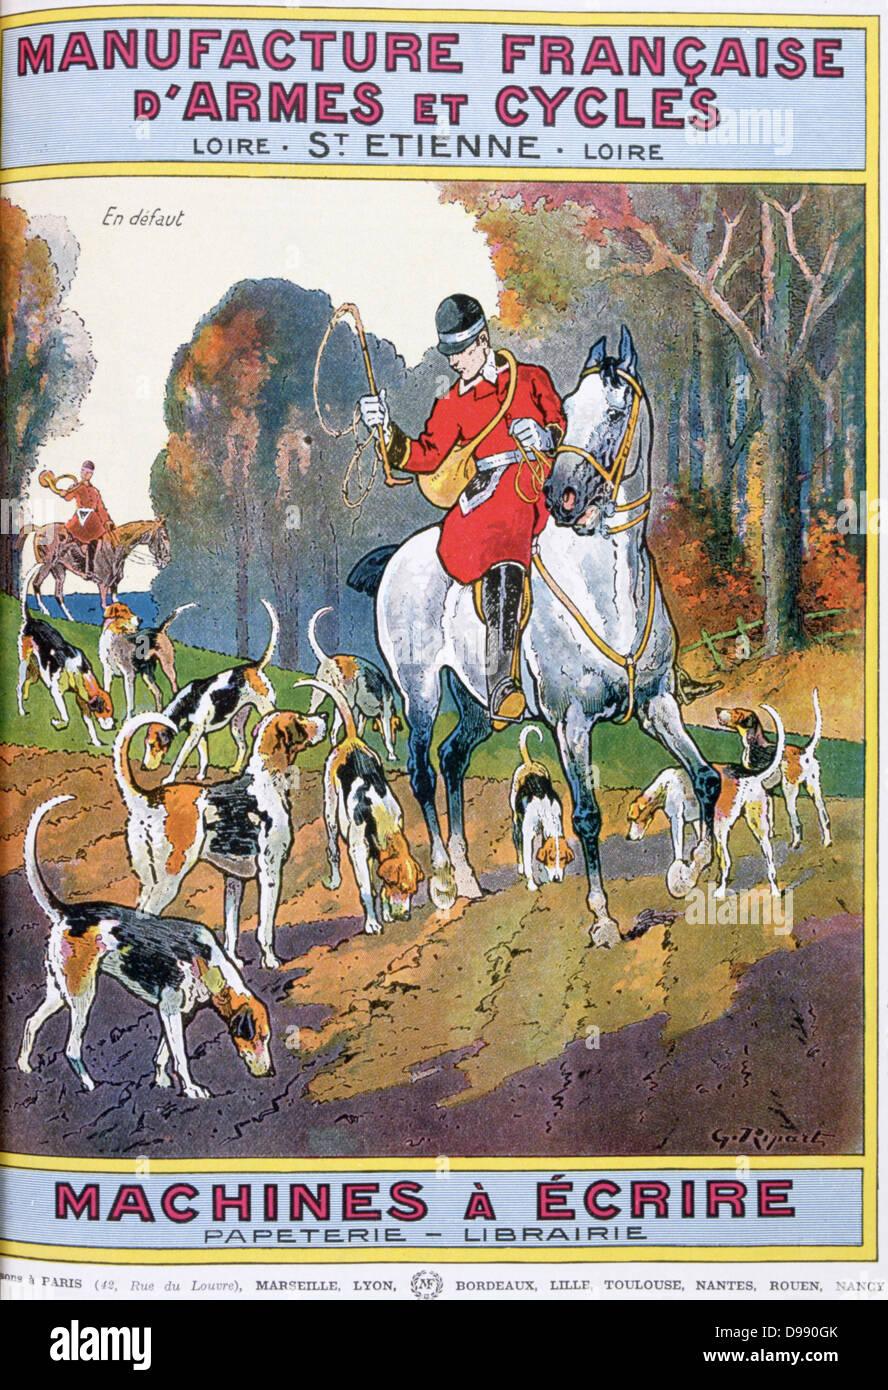 Cover of catalogue of Manufrance (Manufacture Francaise d'Armes et Cycles) Saint Etienne, c1920. French huntsmen. - Stock Image